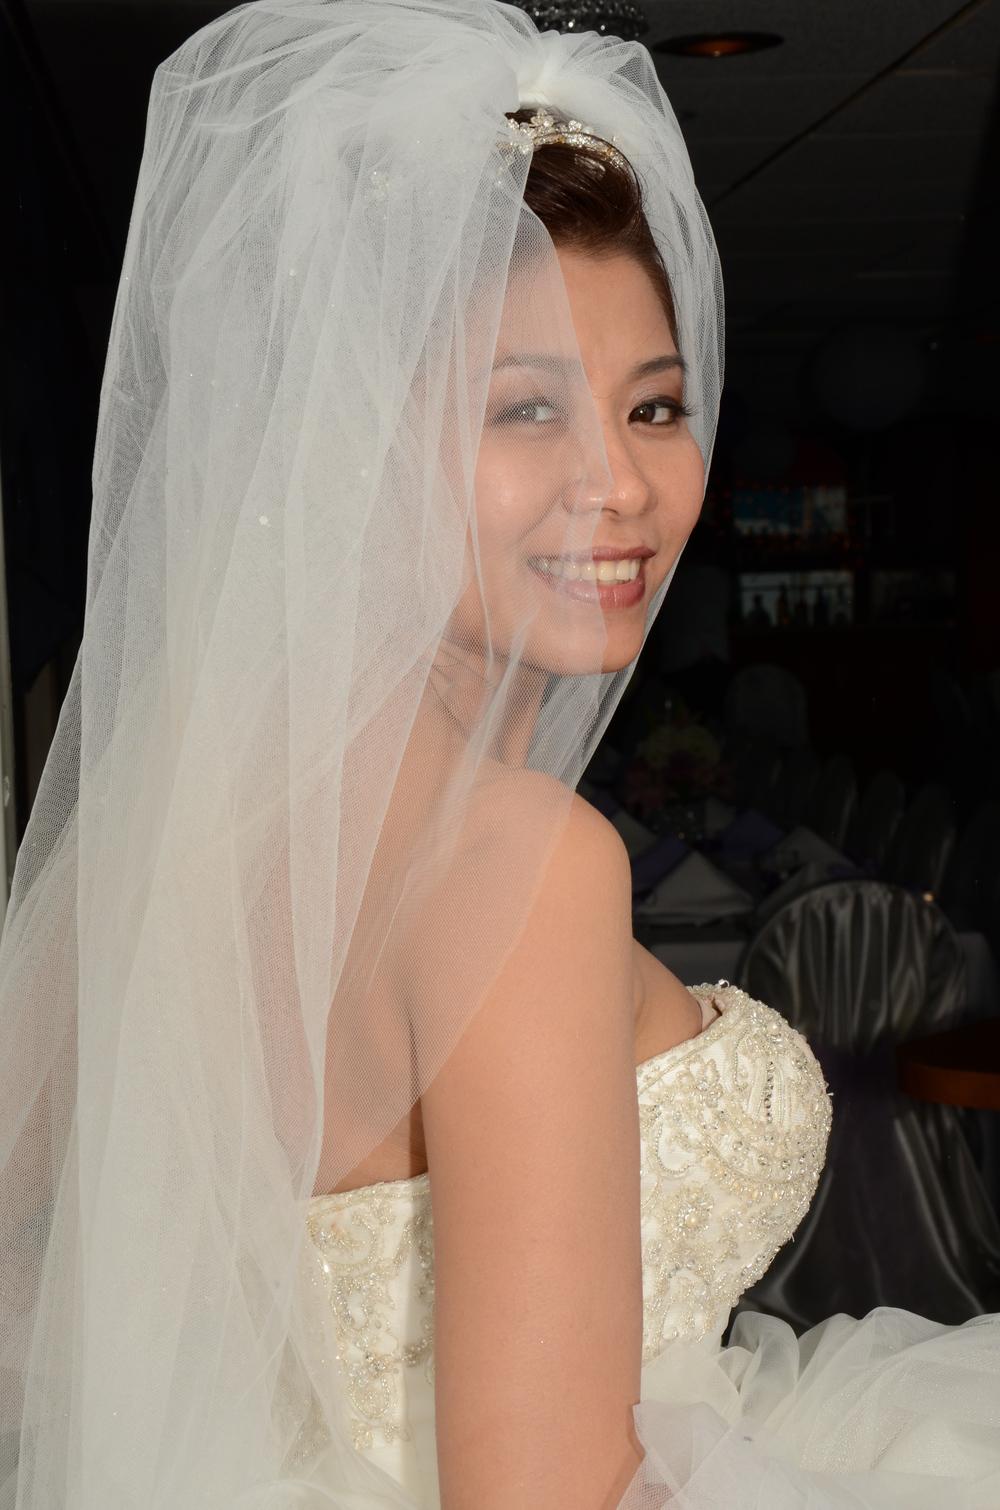 carlla-juffo-weddings-photography-sarasota-florida (140).JPG